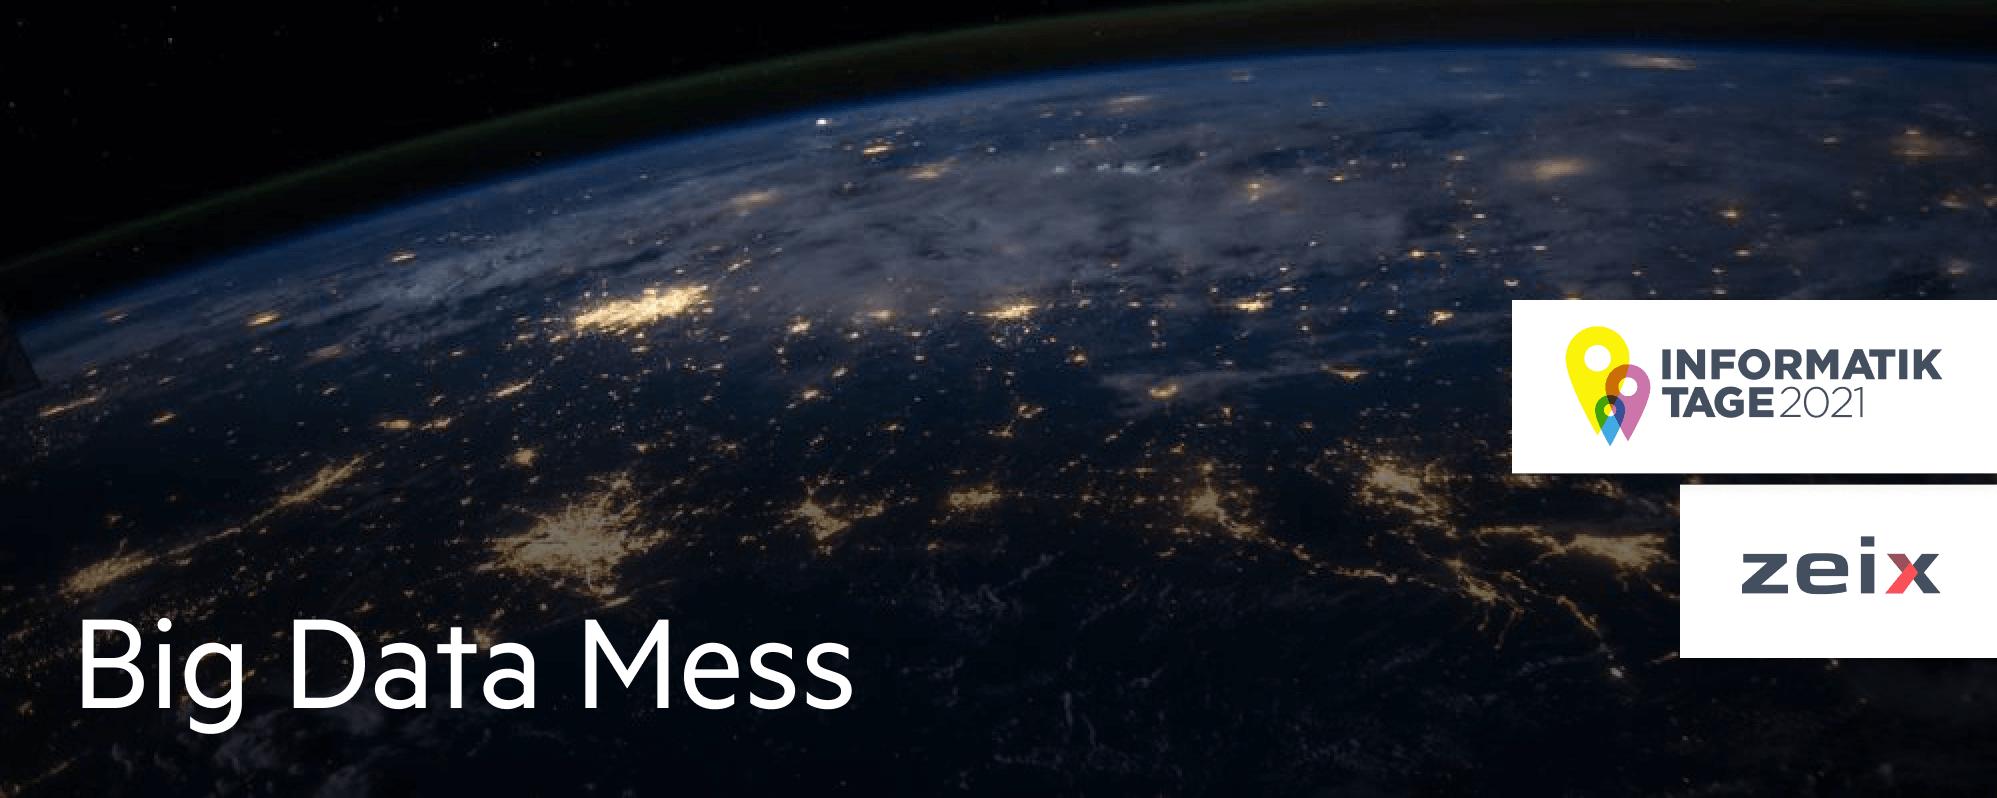 Big Data Mess